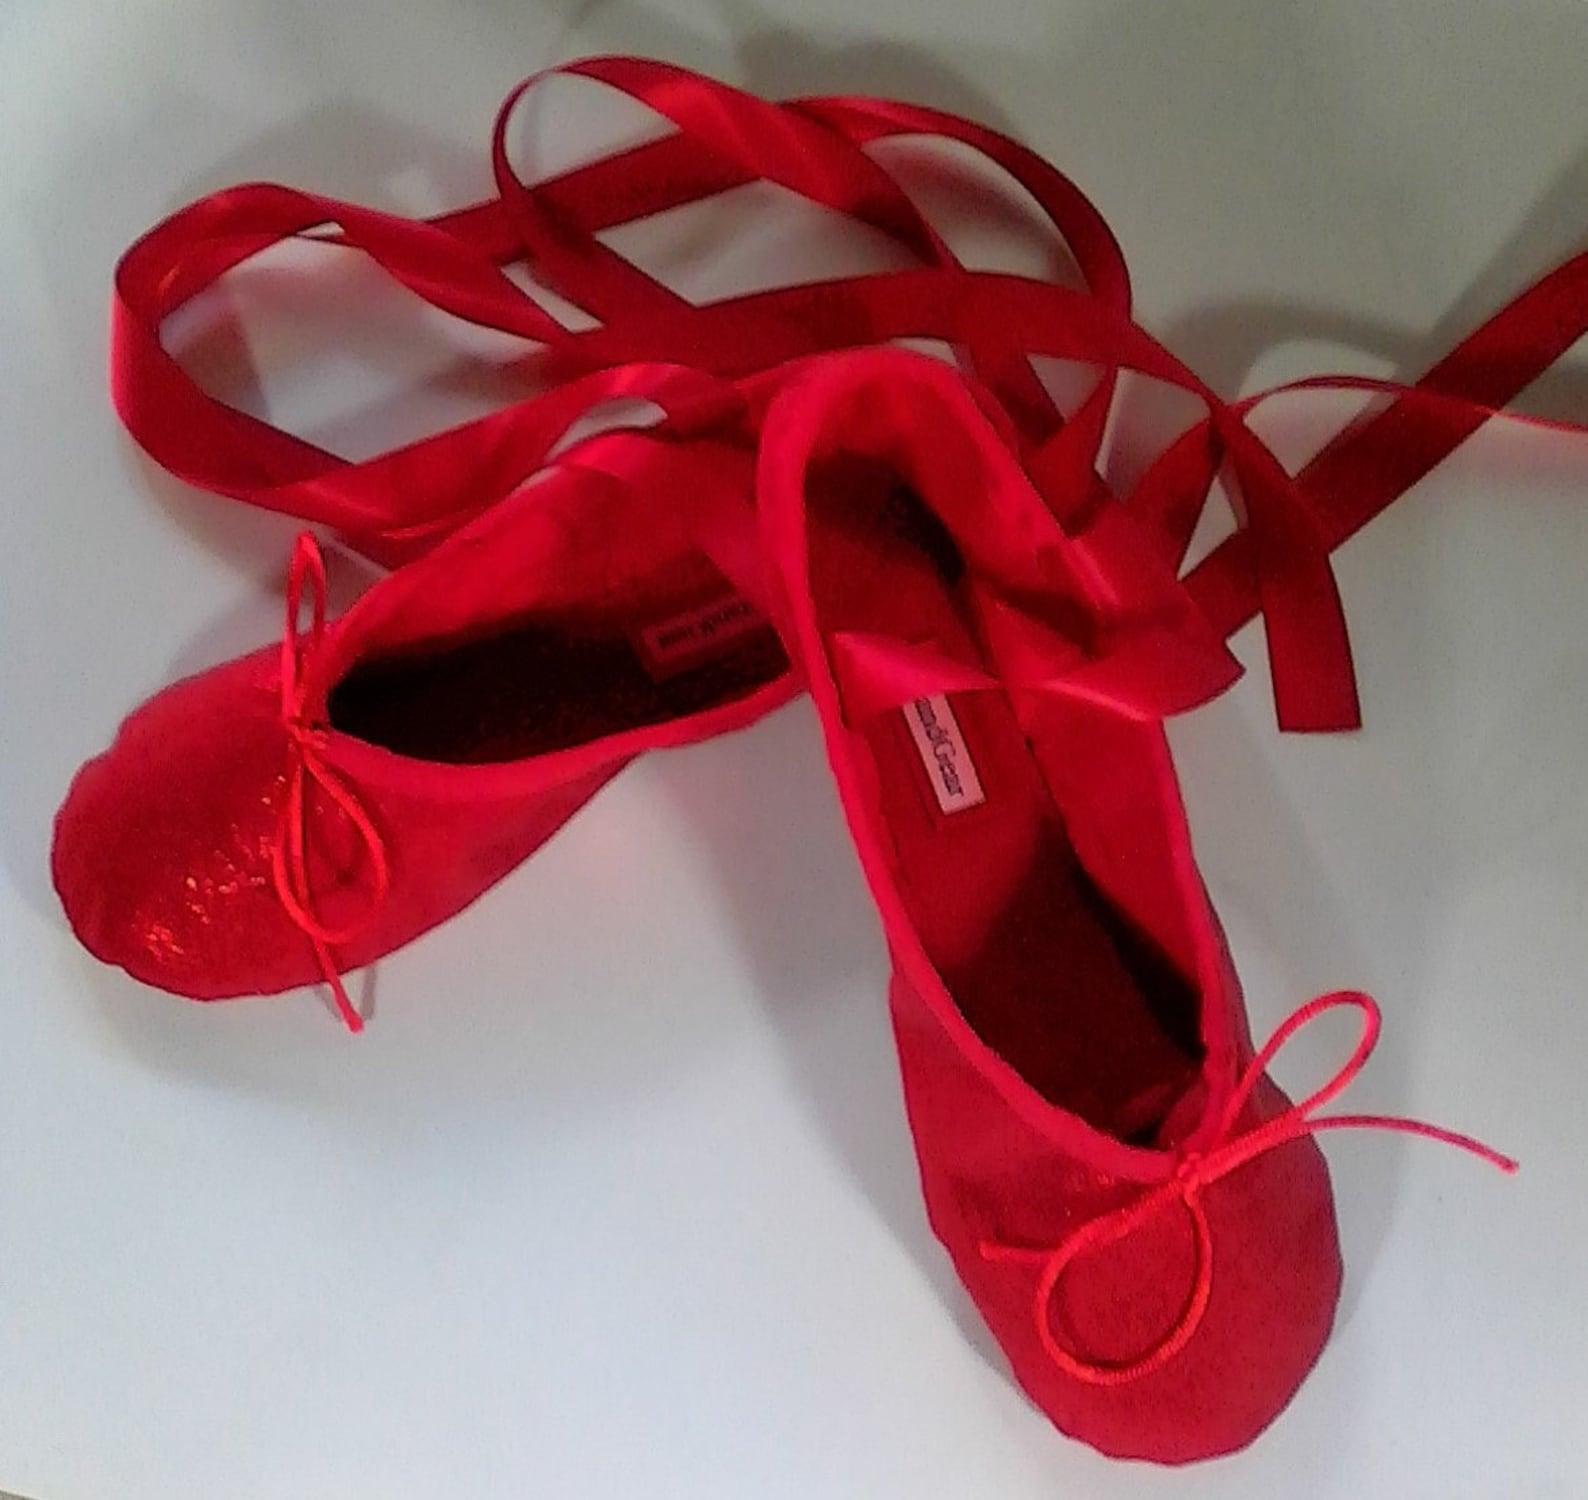 ruby red sparkle ballet slippers - full sole - children's sizes